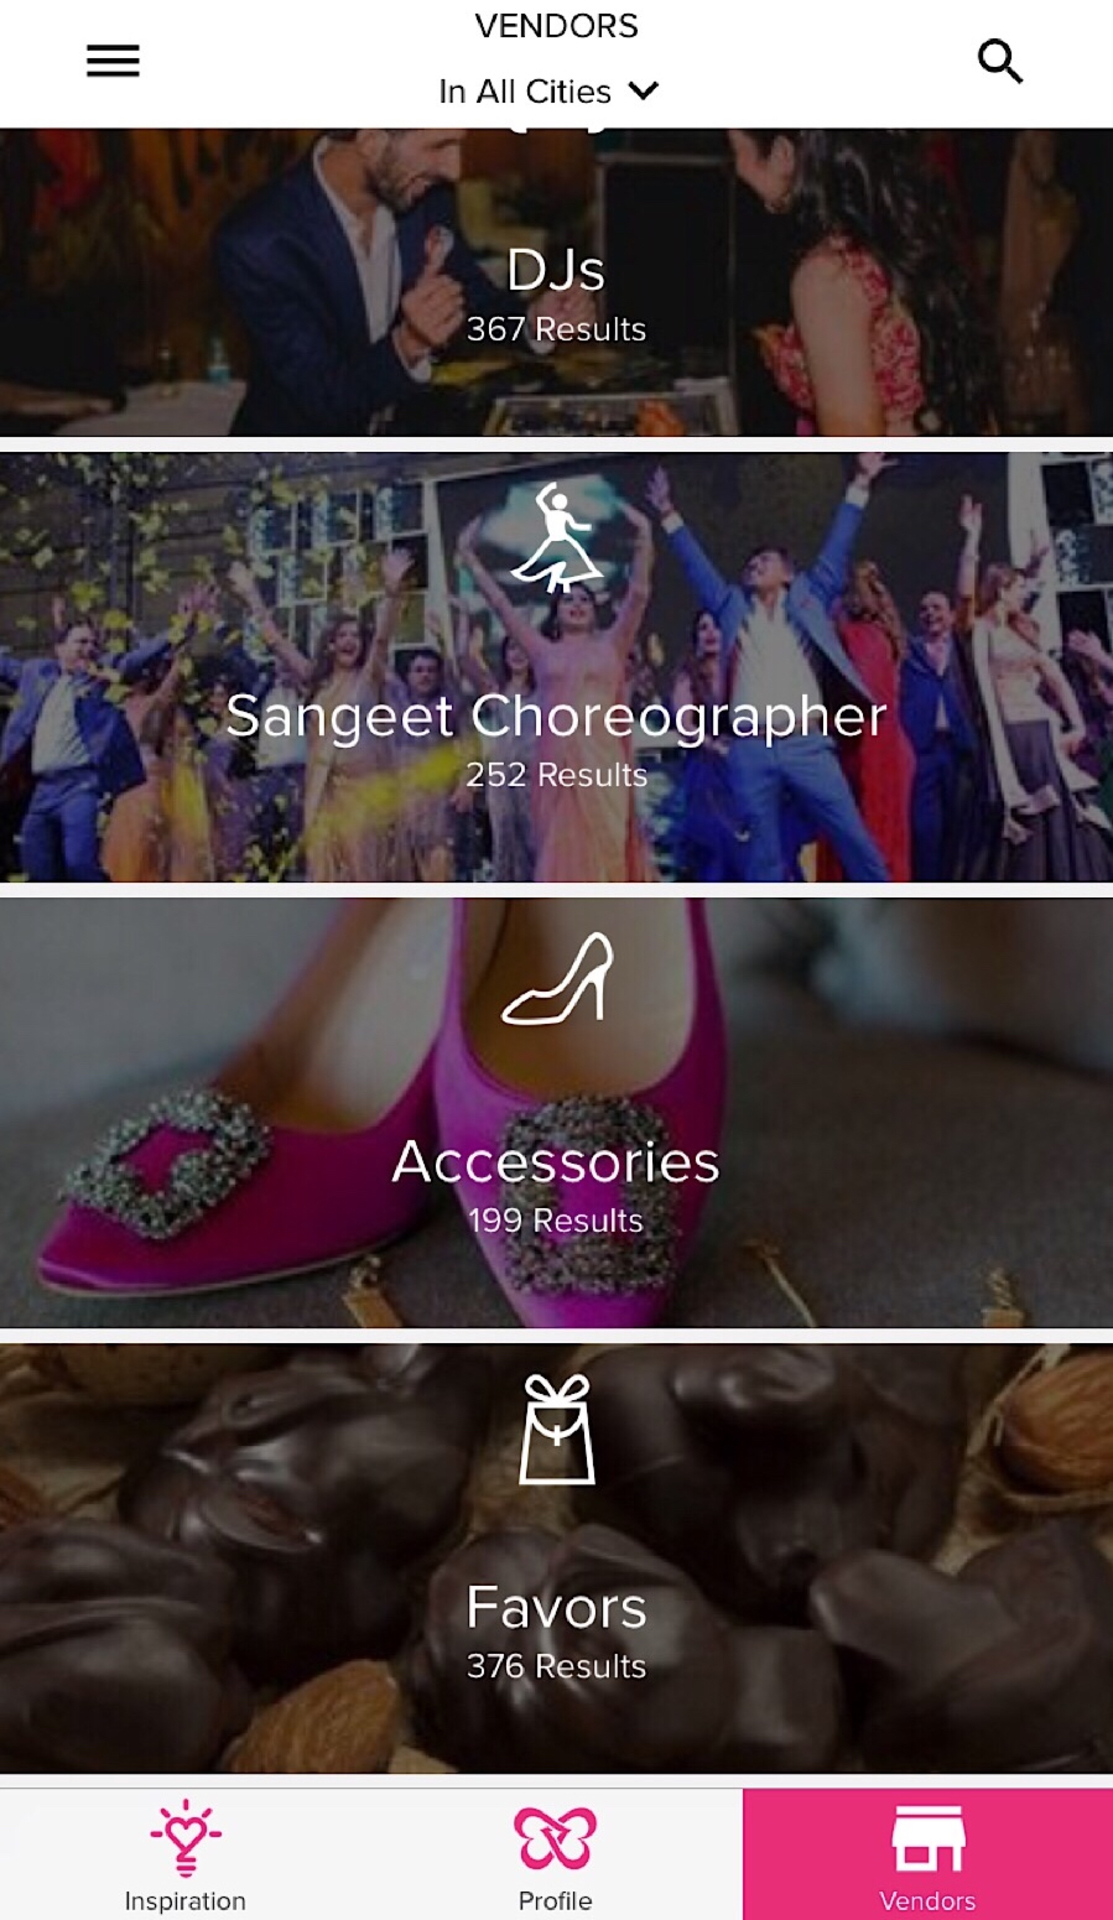 THE GLAM NUT - Fashion & Lifestyle Blog - AF36E7CE-7E1A-4564-B960-D597D1CC1A9C